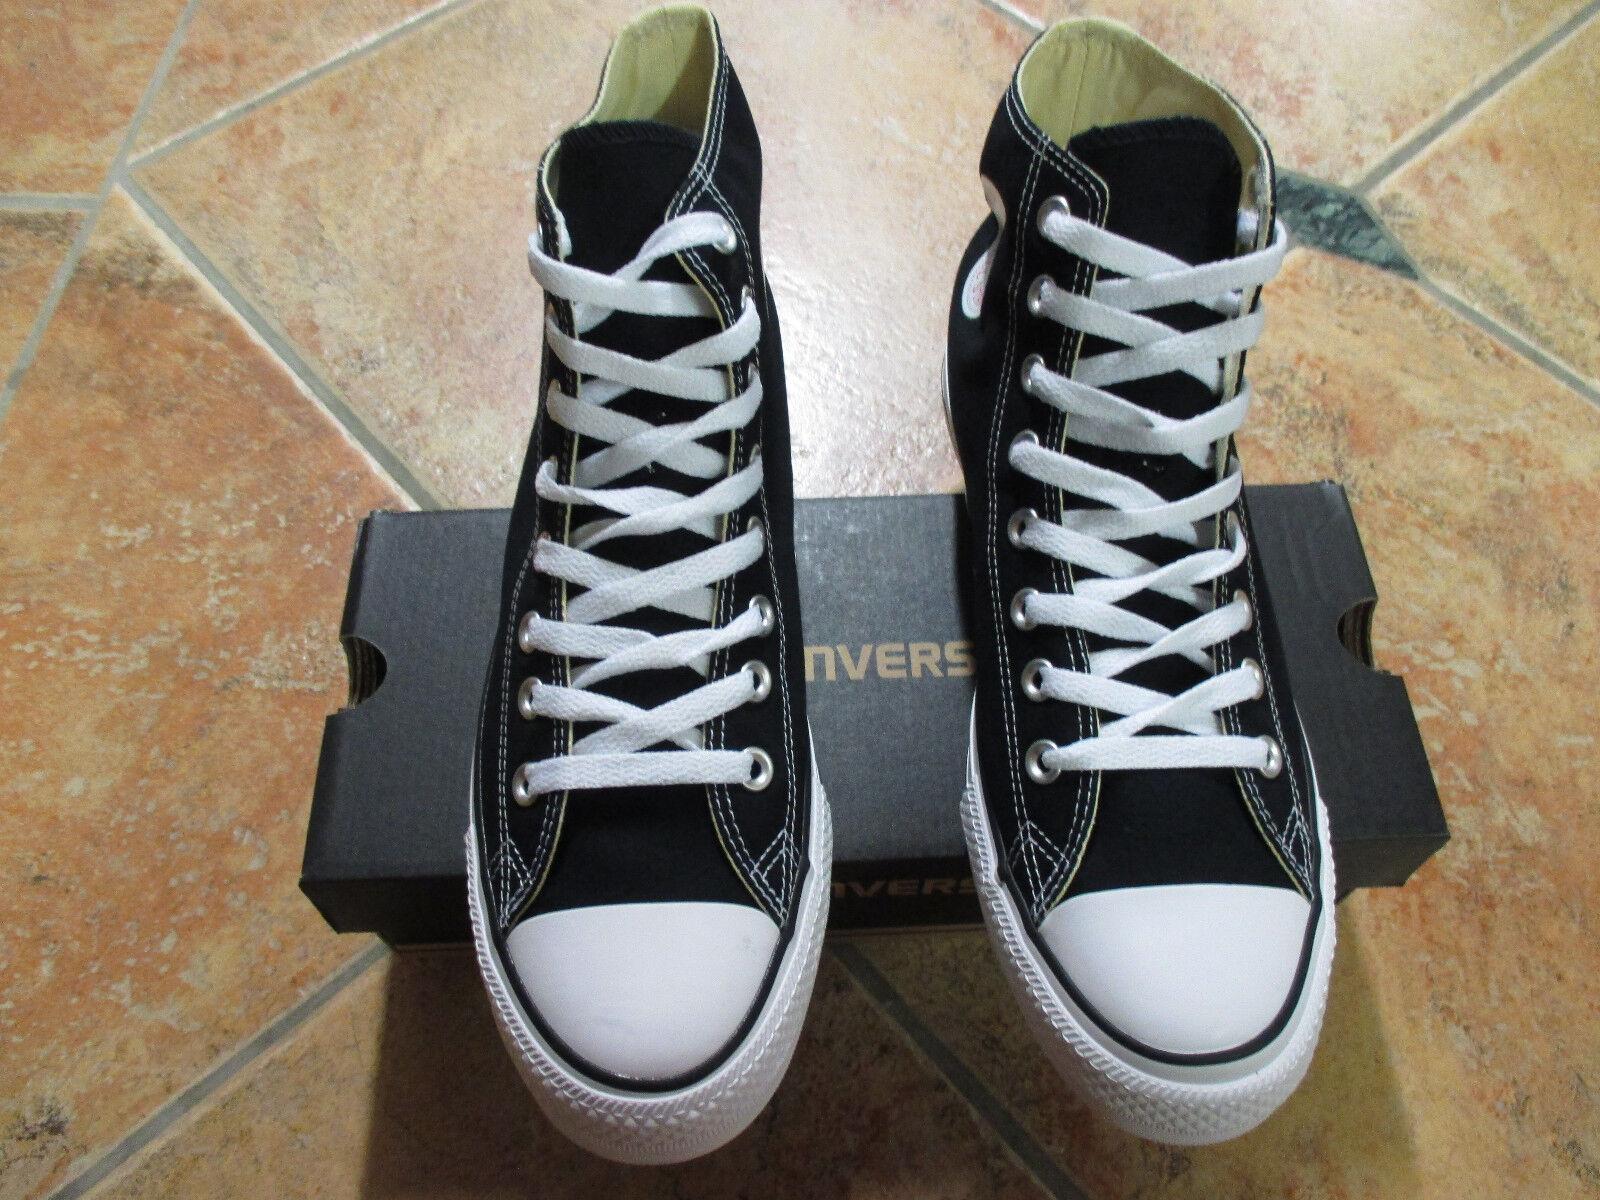 Converse Chucks All Star HI Größe 43 BLACK schwarz M9160C Neu  Sneaker